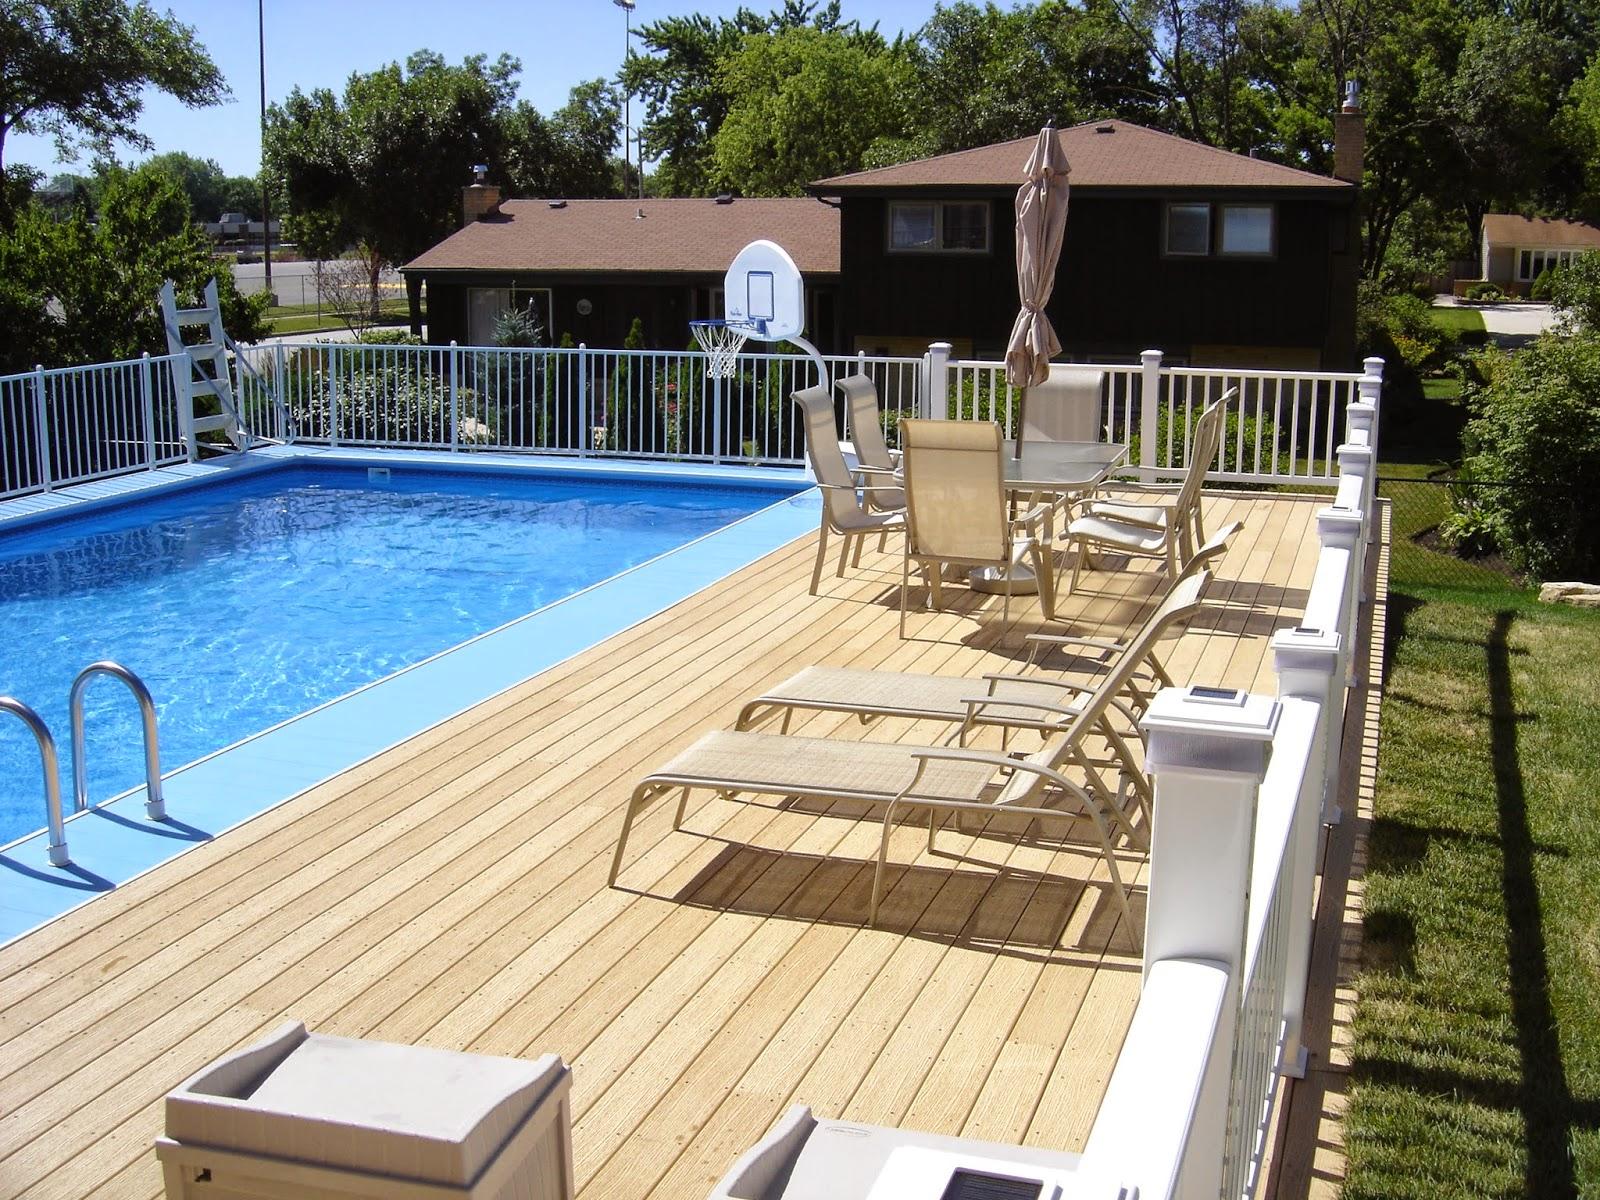 Amazing Modern Pool Deck Design For Swimming Pool Design ... on Pool Deck Patio Ideas  id=65629